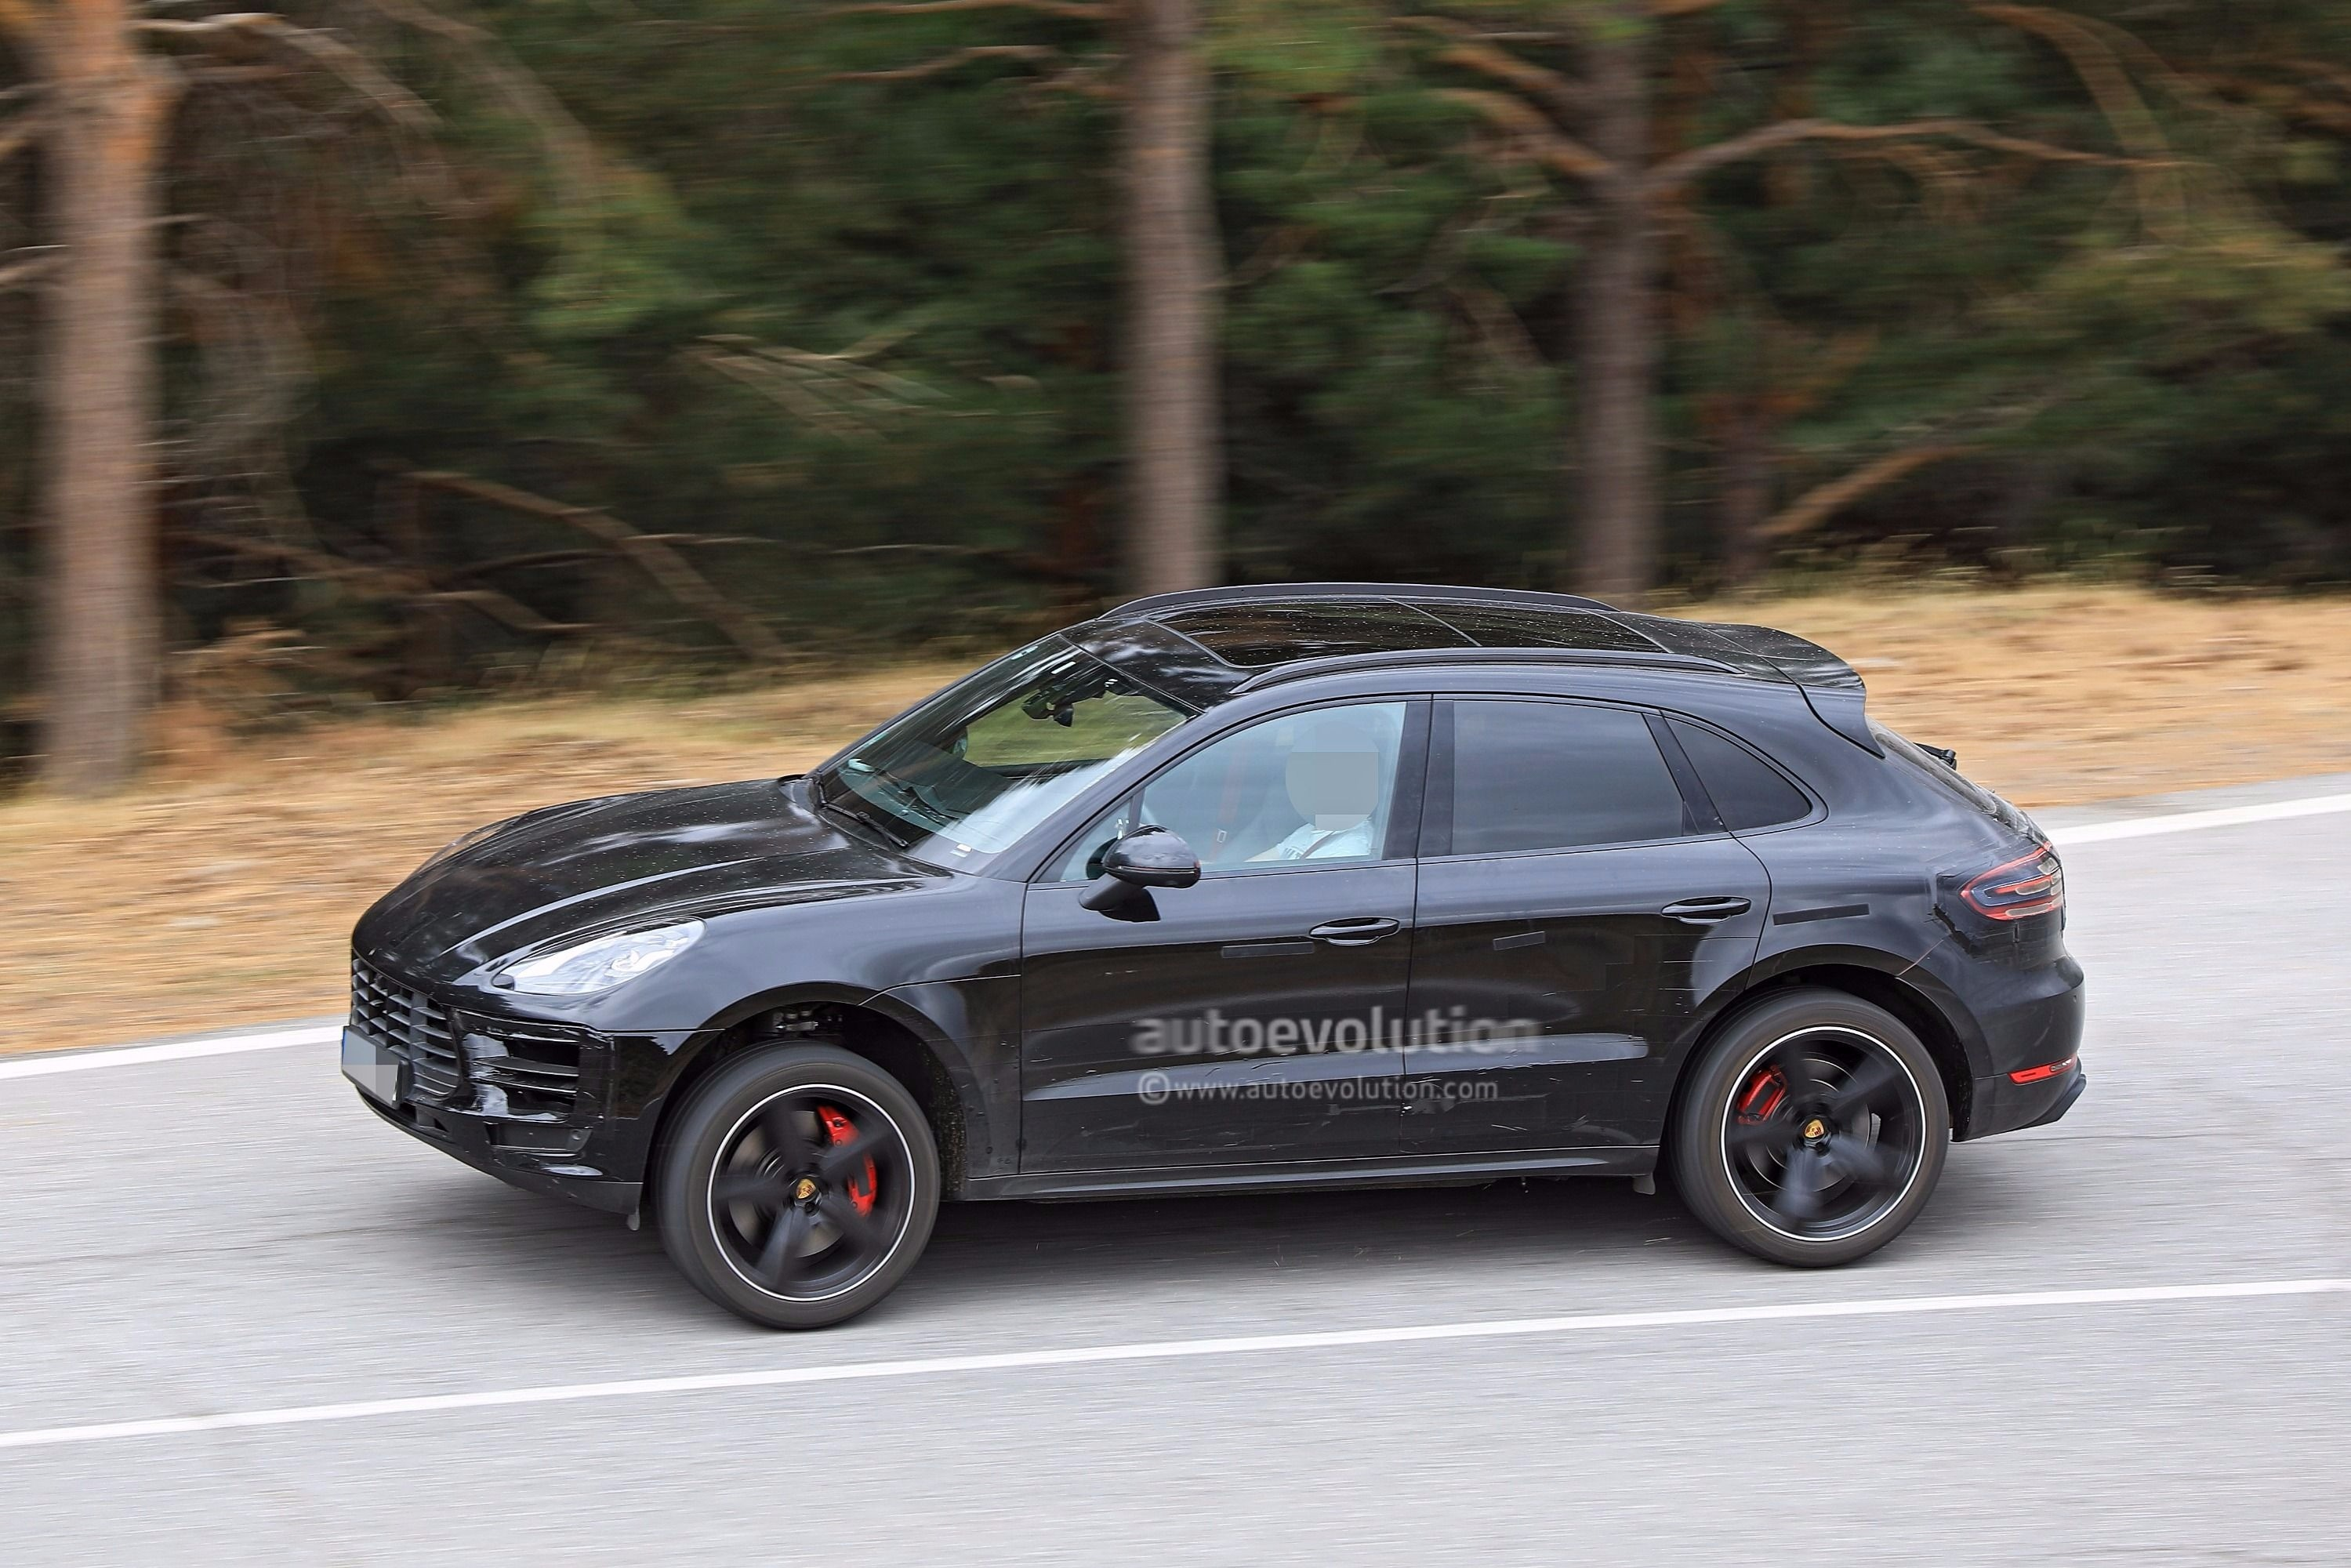 Spyshots 2019 Porsche Macan Prototype Poses For The Camera